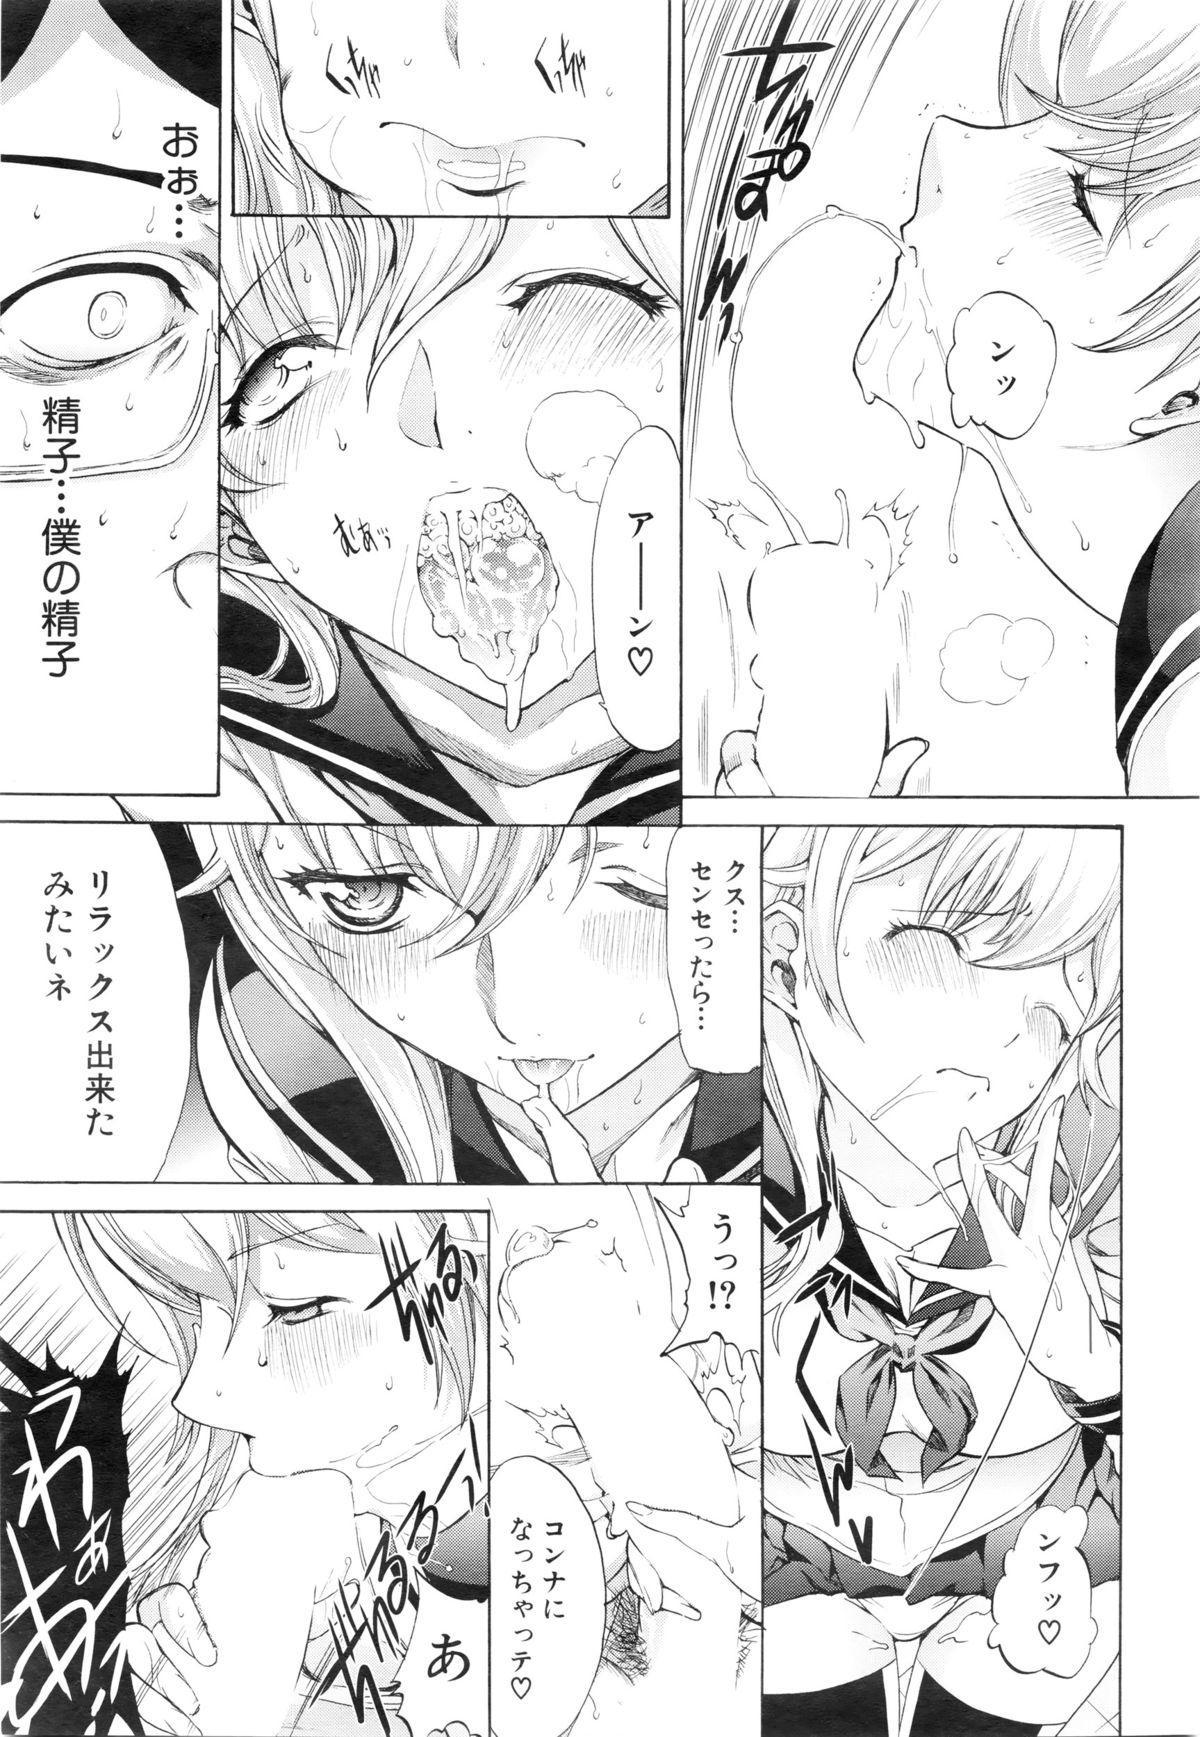 COMIC Mugen Tensei 2016-01 12